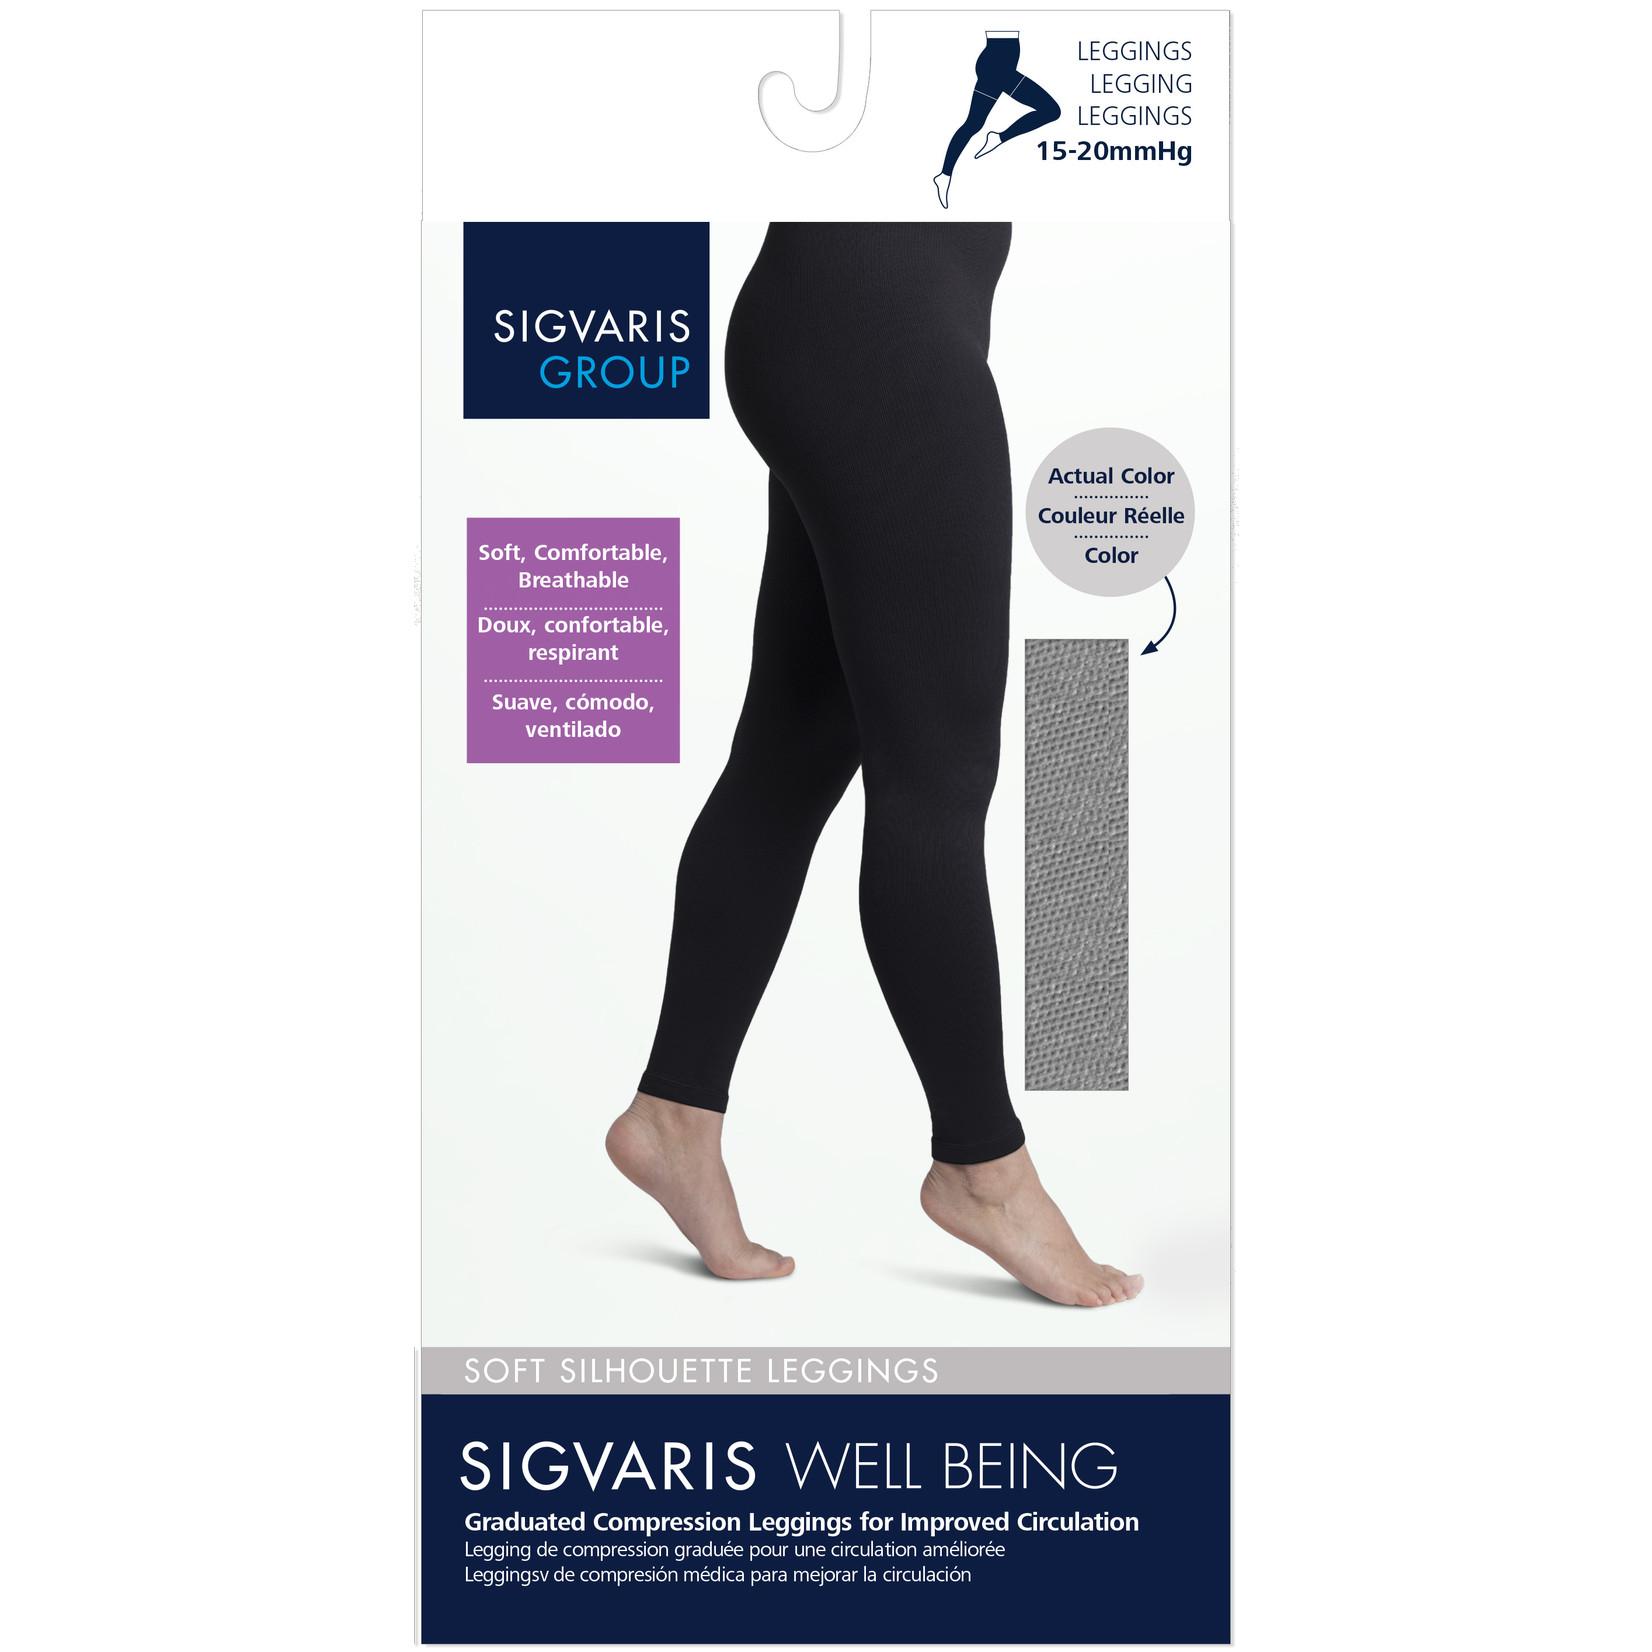 SIGVARIS Women's Soft Silhouette Leggings